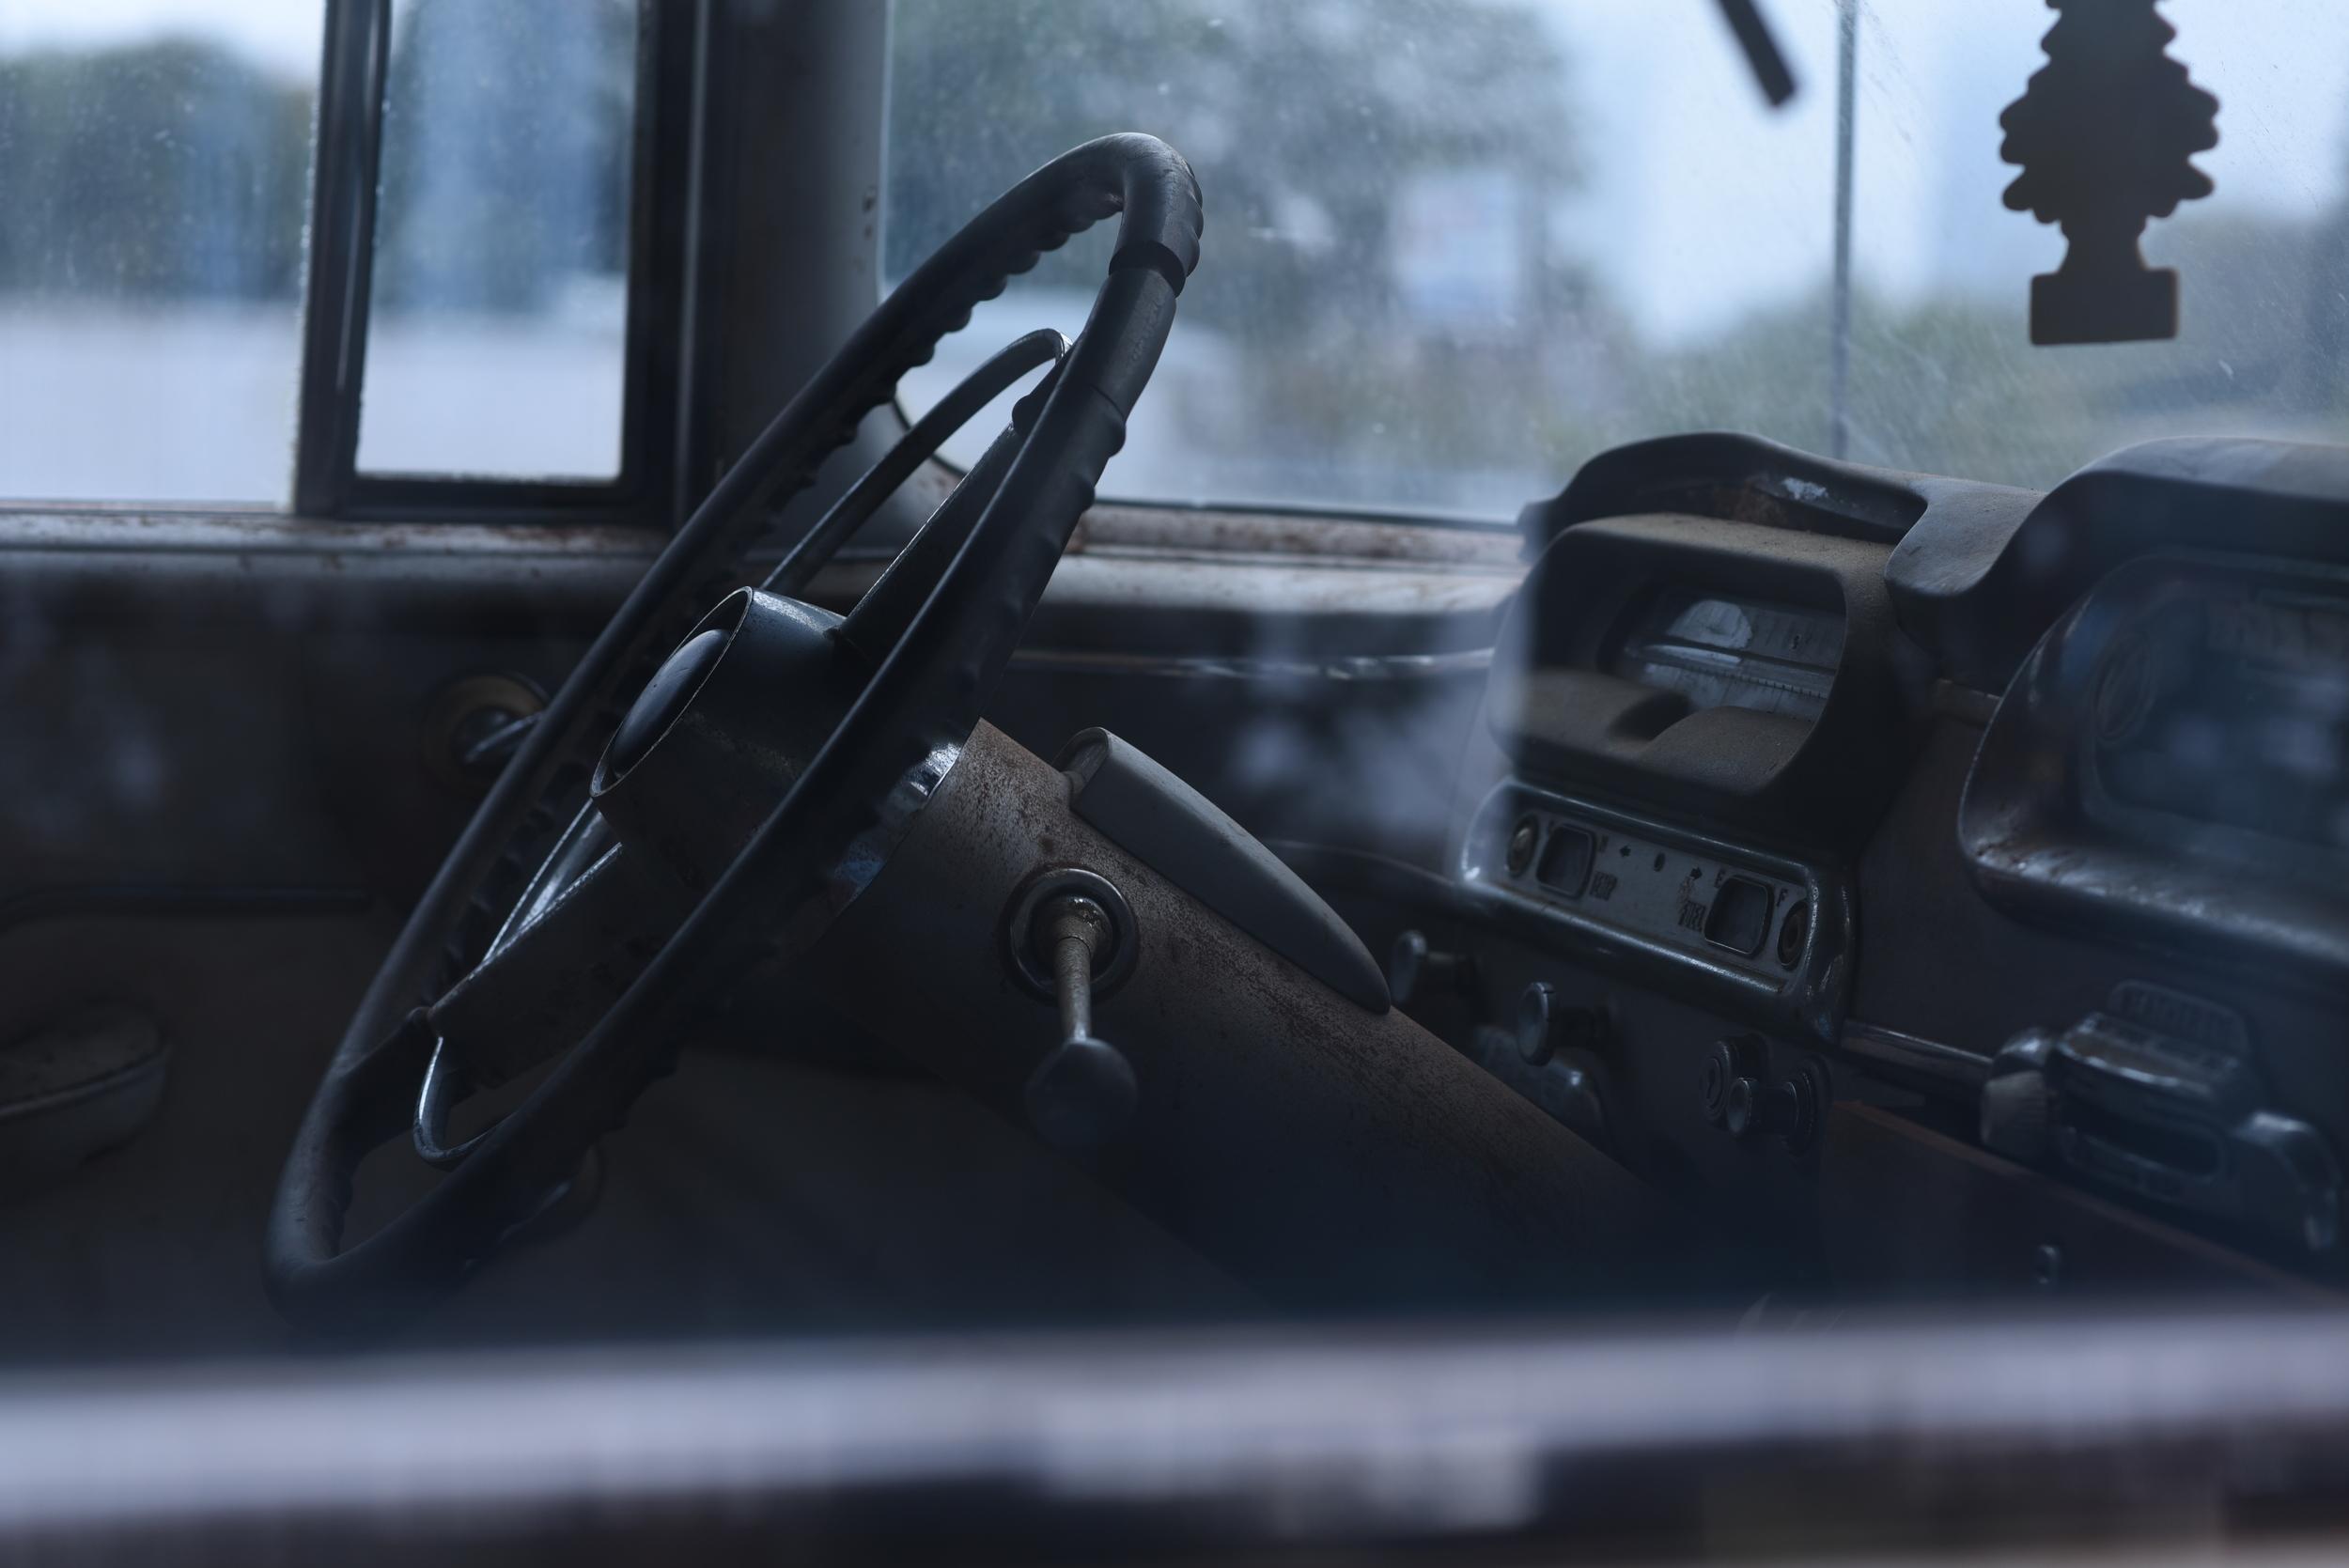 inside-of-vintage-car.jpg